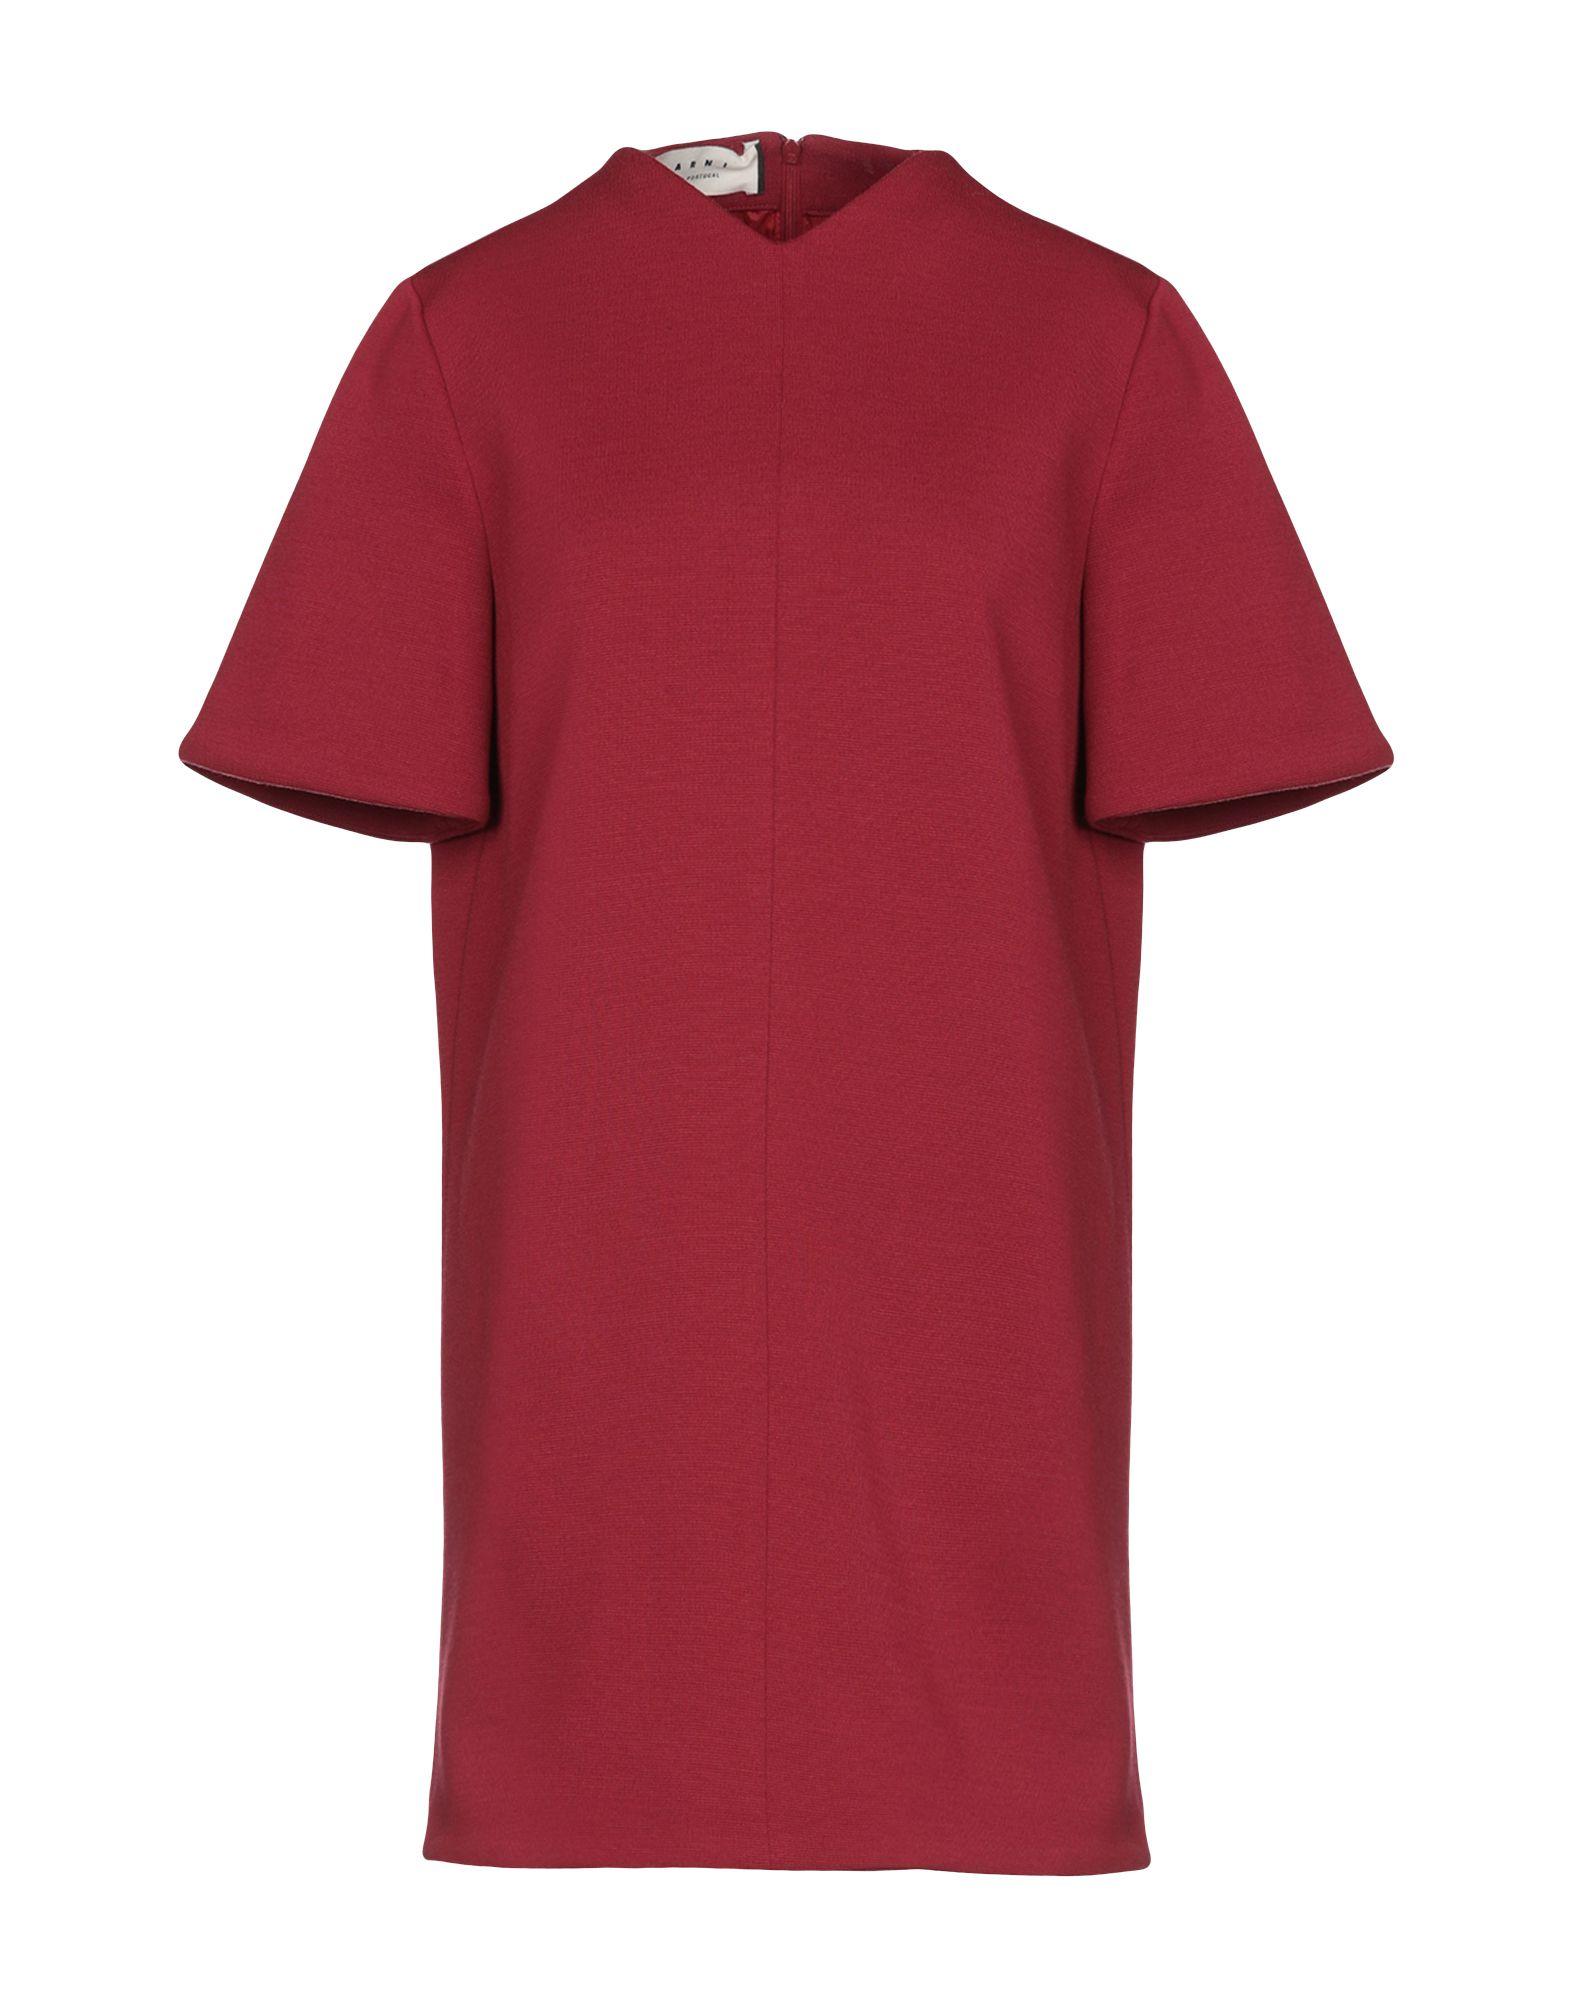 MARNI Блузка блузка с рисунком короткие рукава вырез сзади